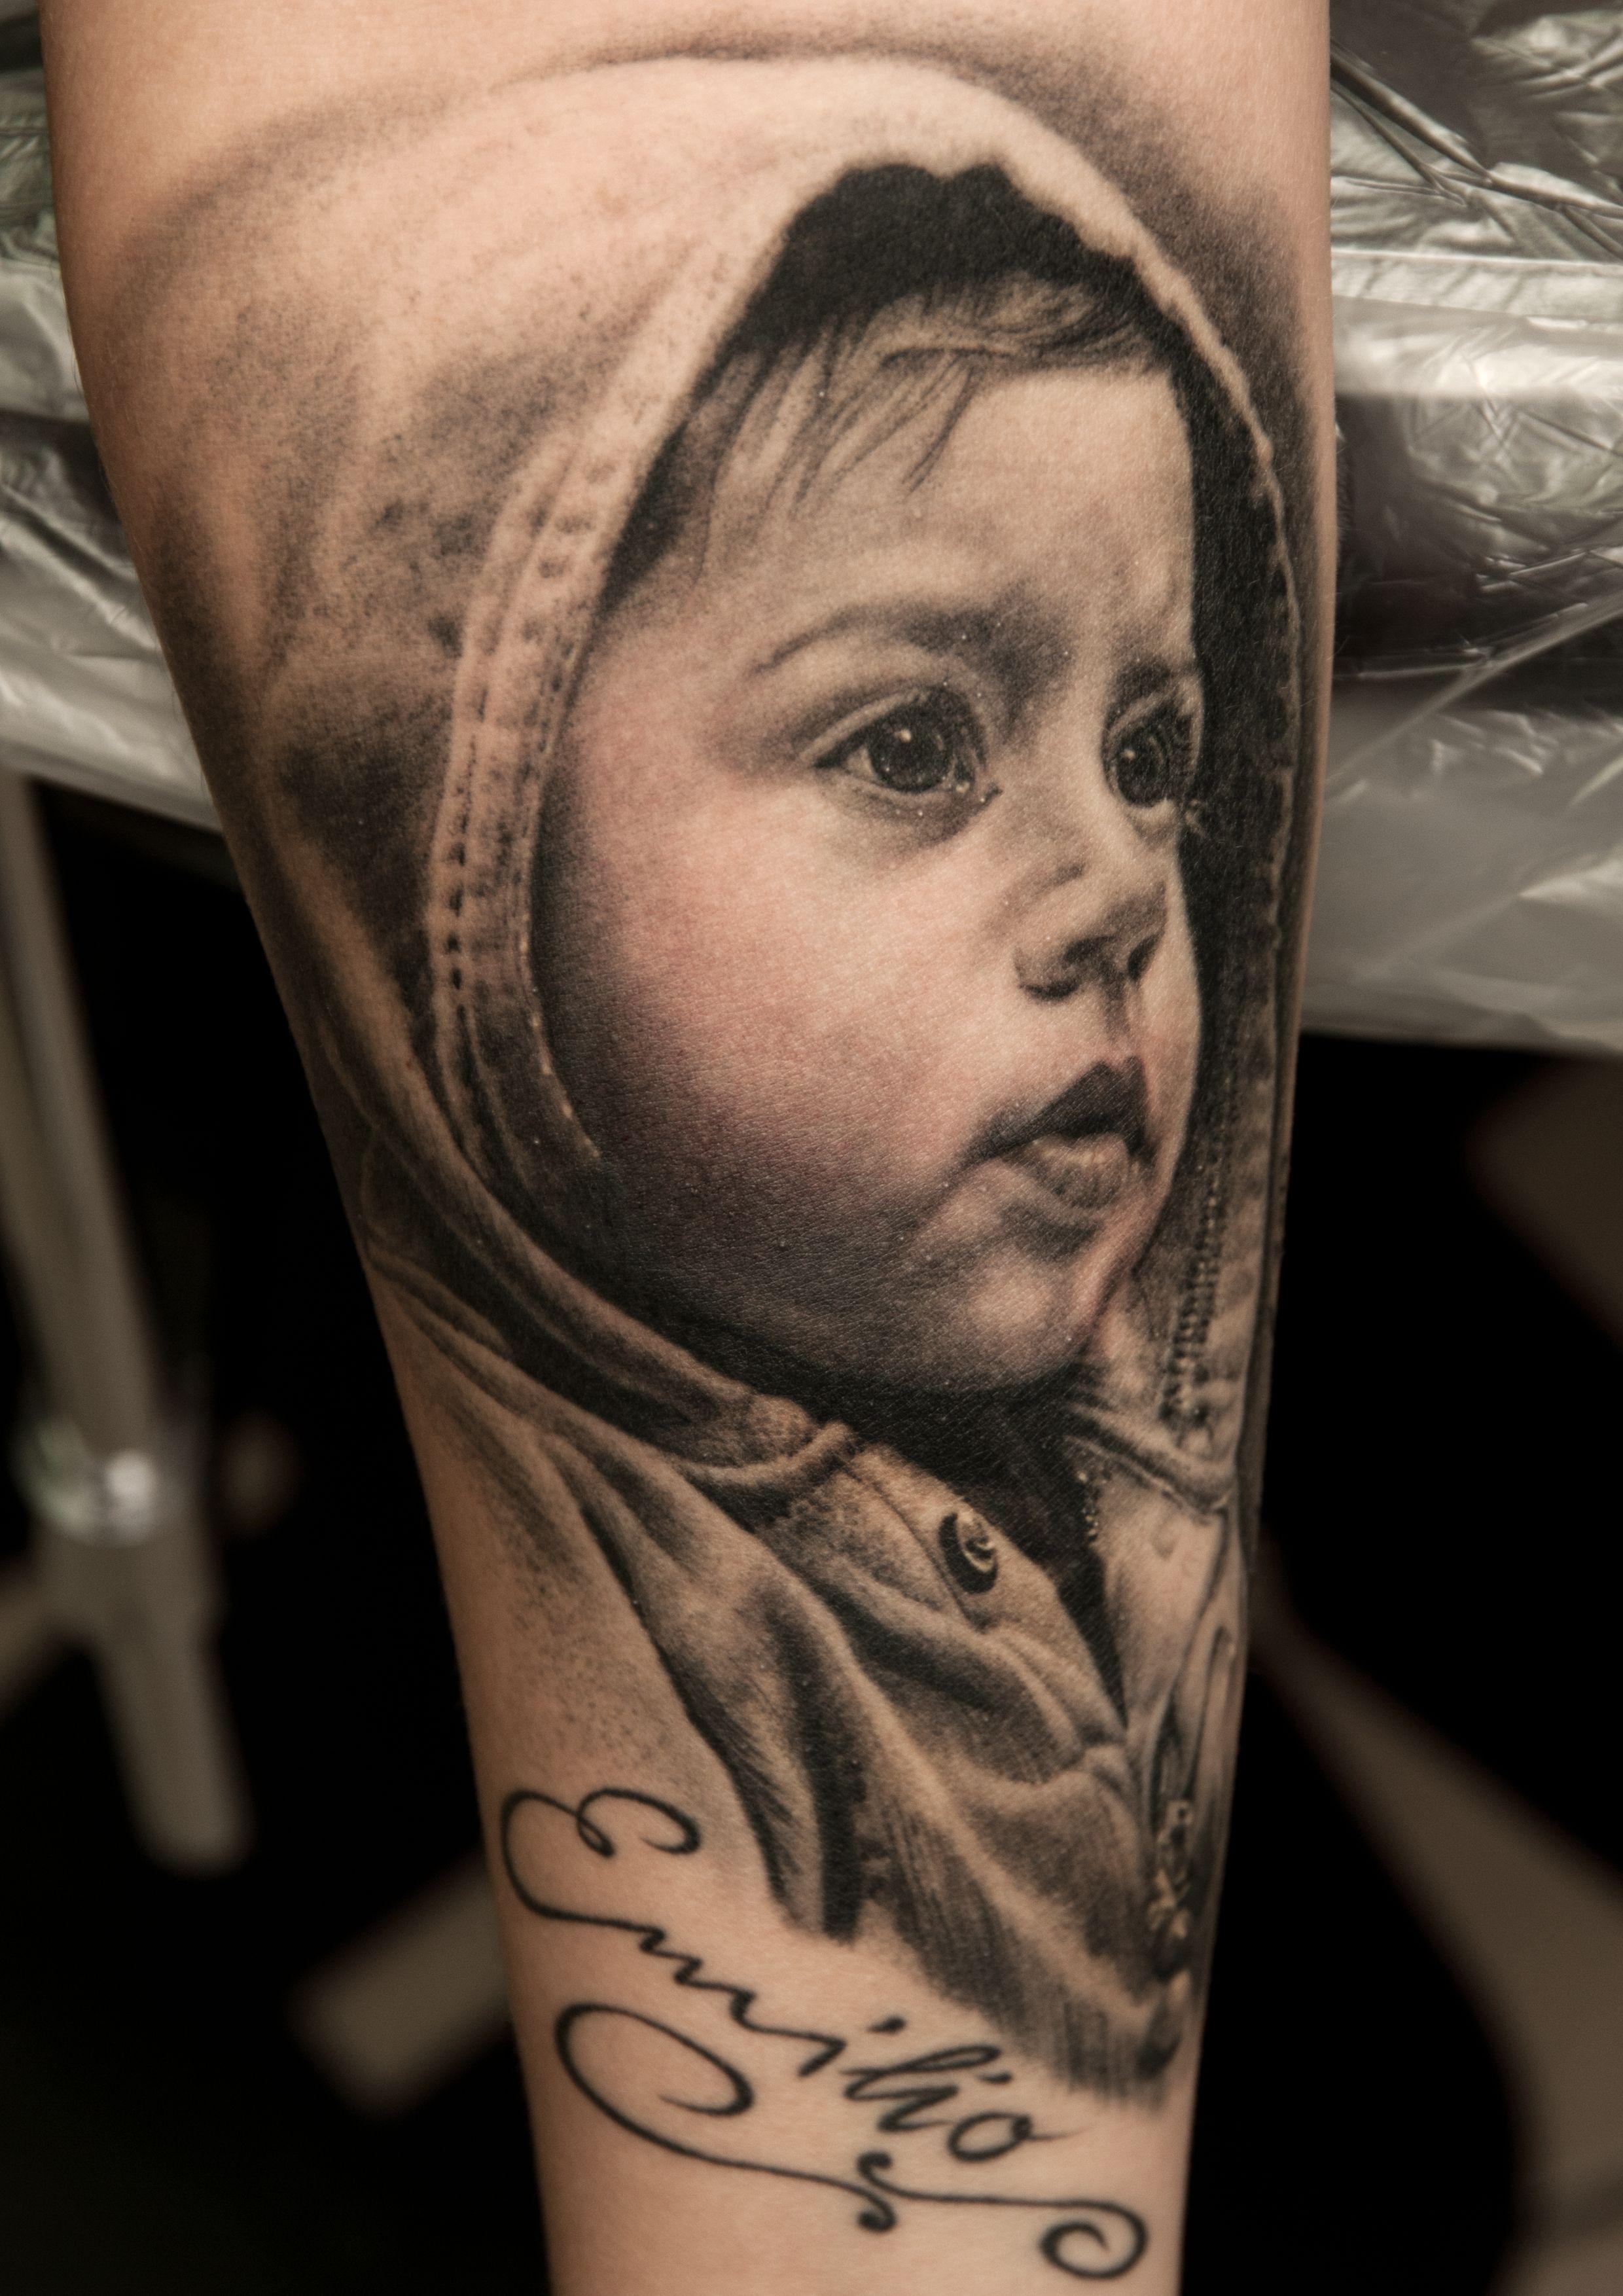 Tattoo Artist Andy Engel Portraitstattoos I Did Of Beloved Ones